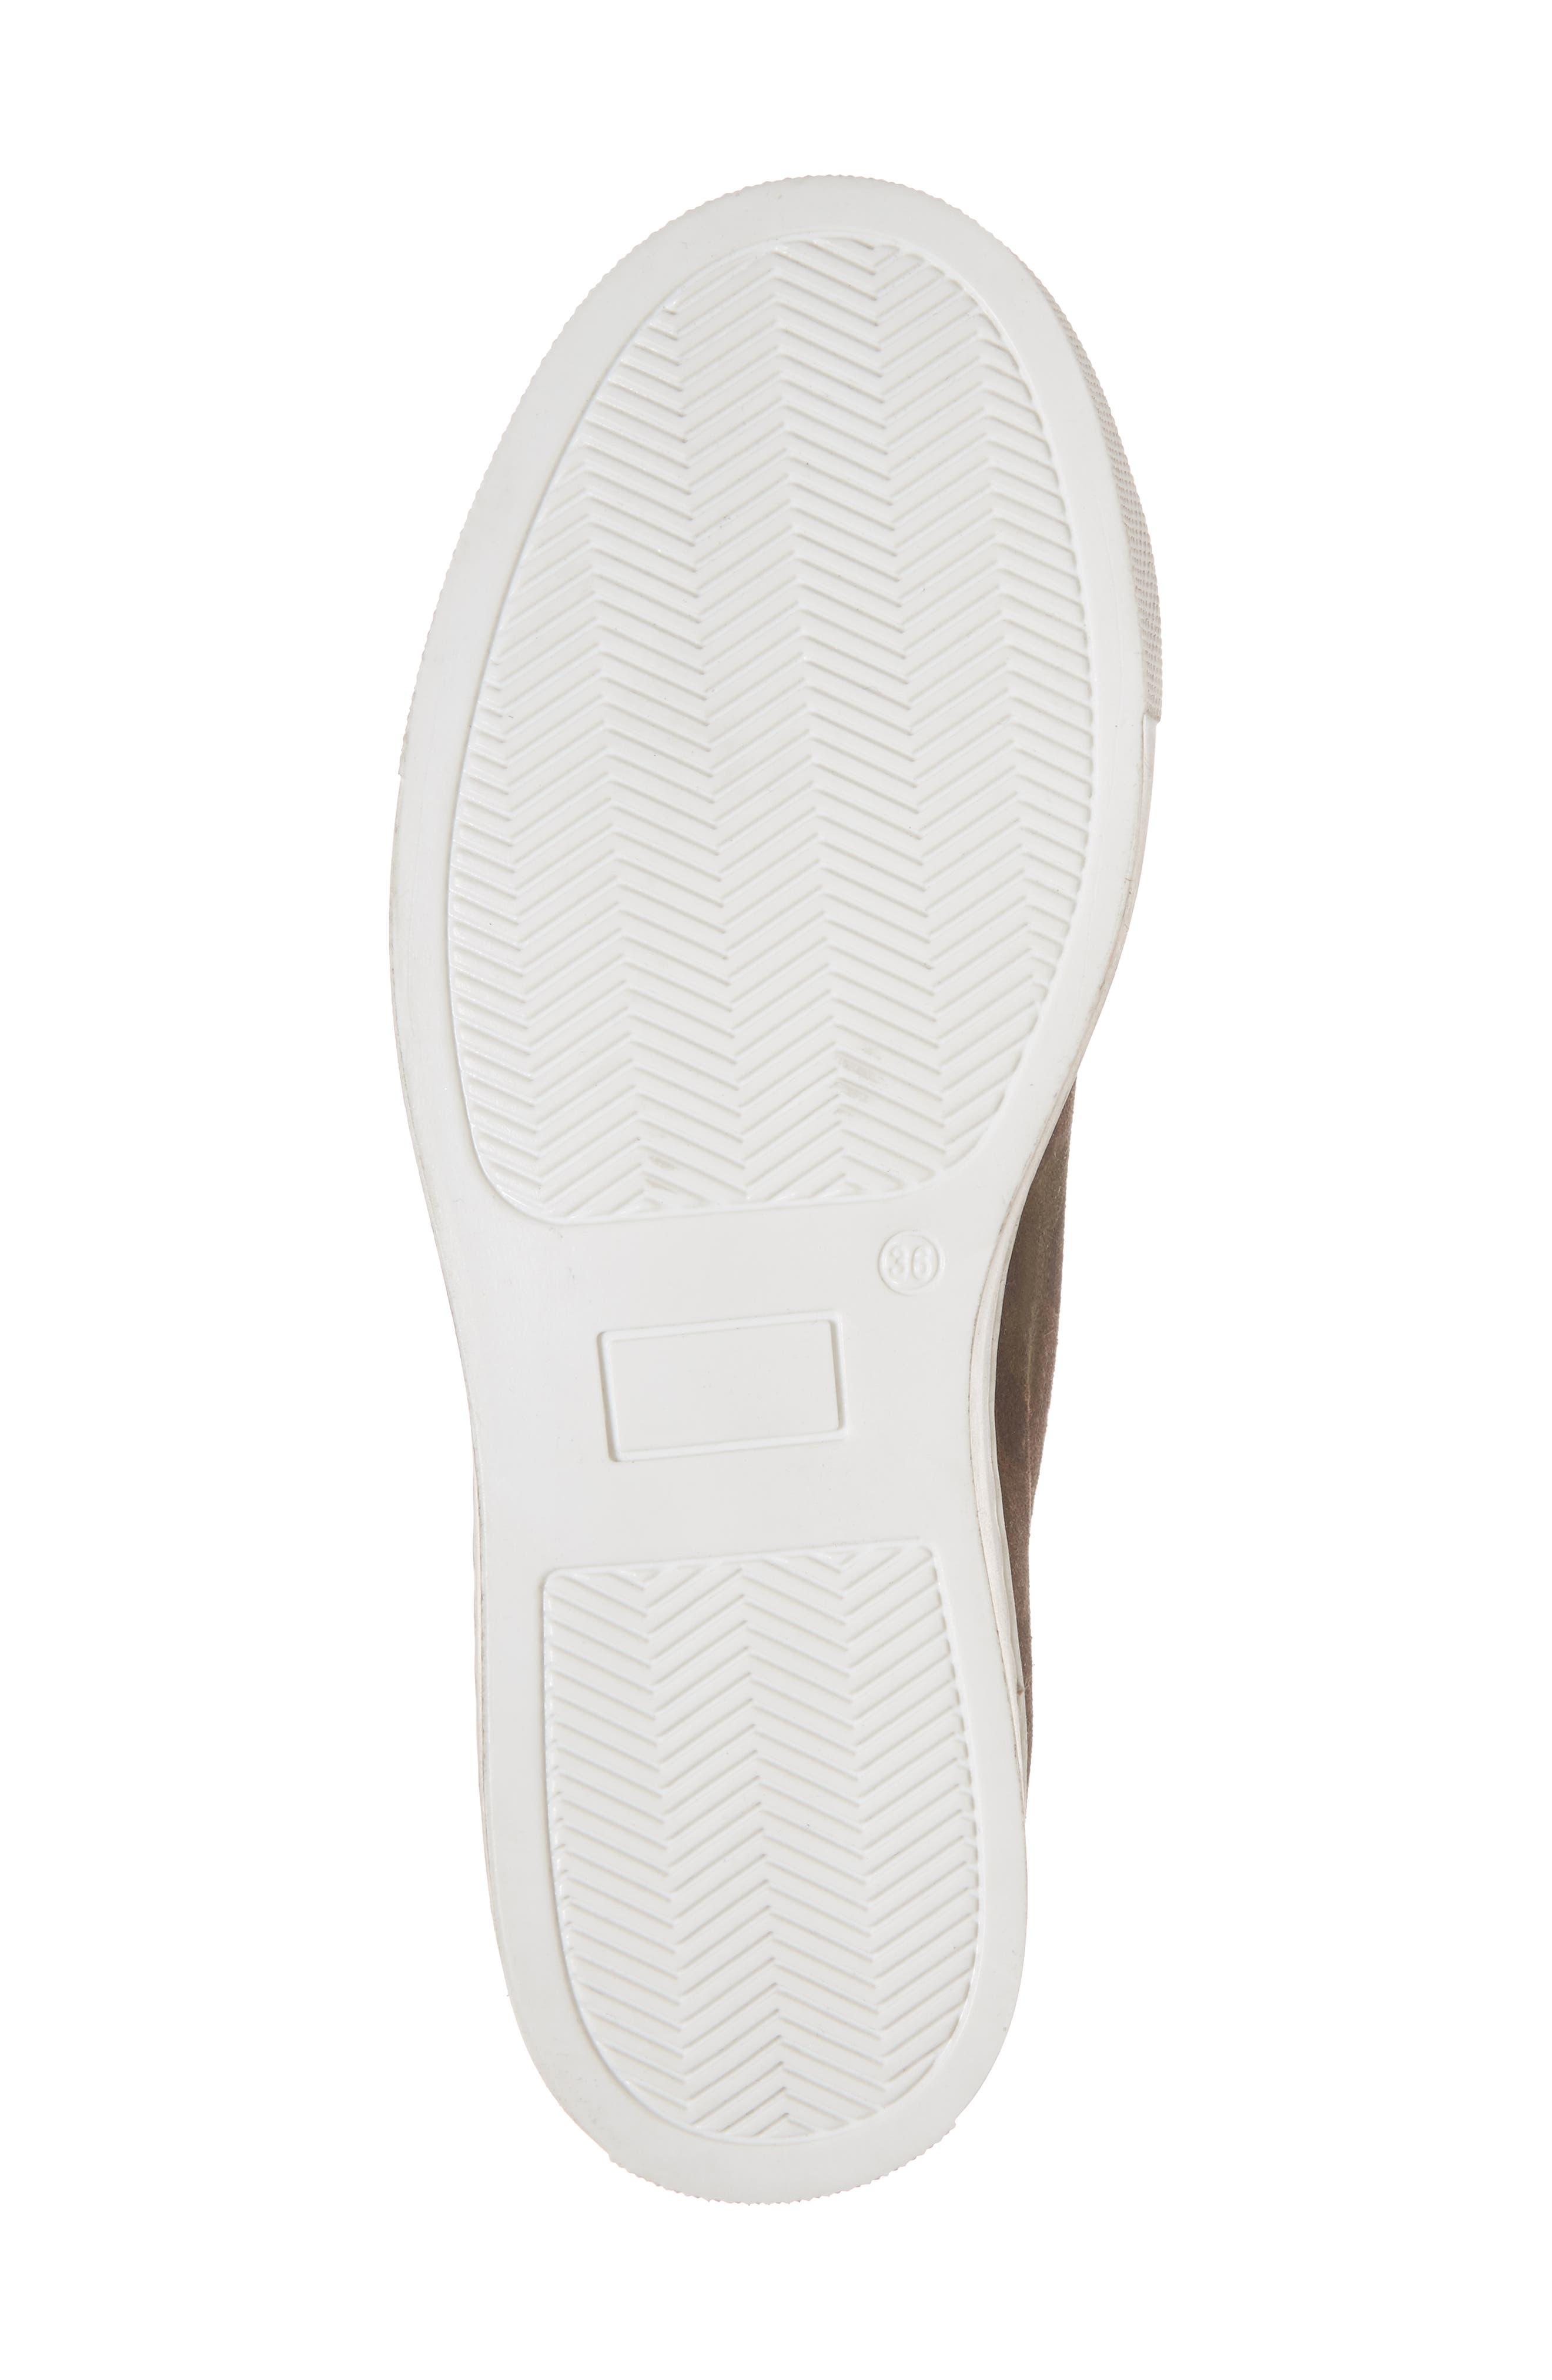 Orissa Sneaker,                             Alternate thumbnail 6, color,                             Military Print Suede